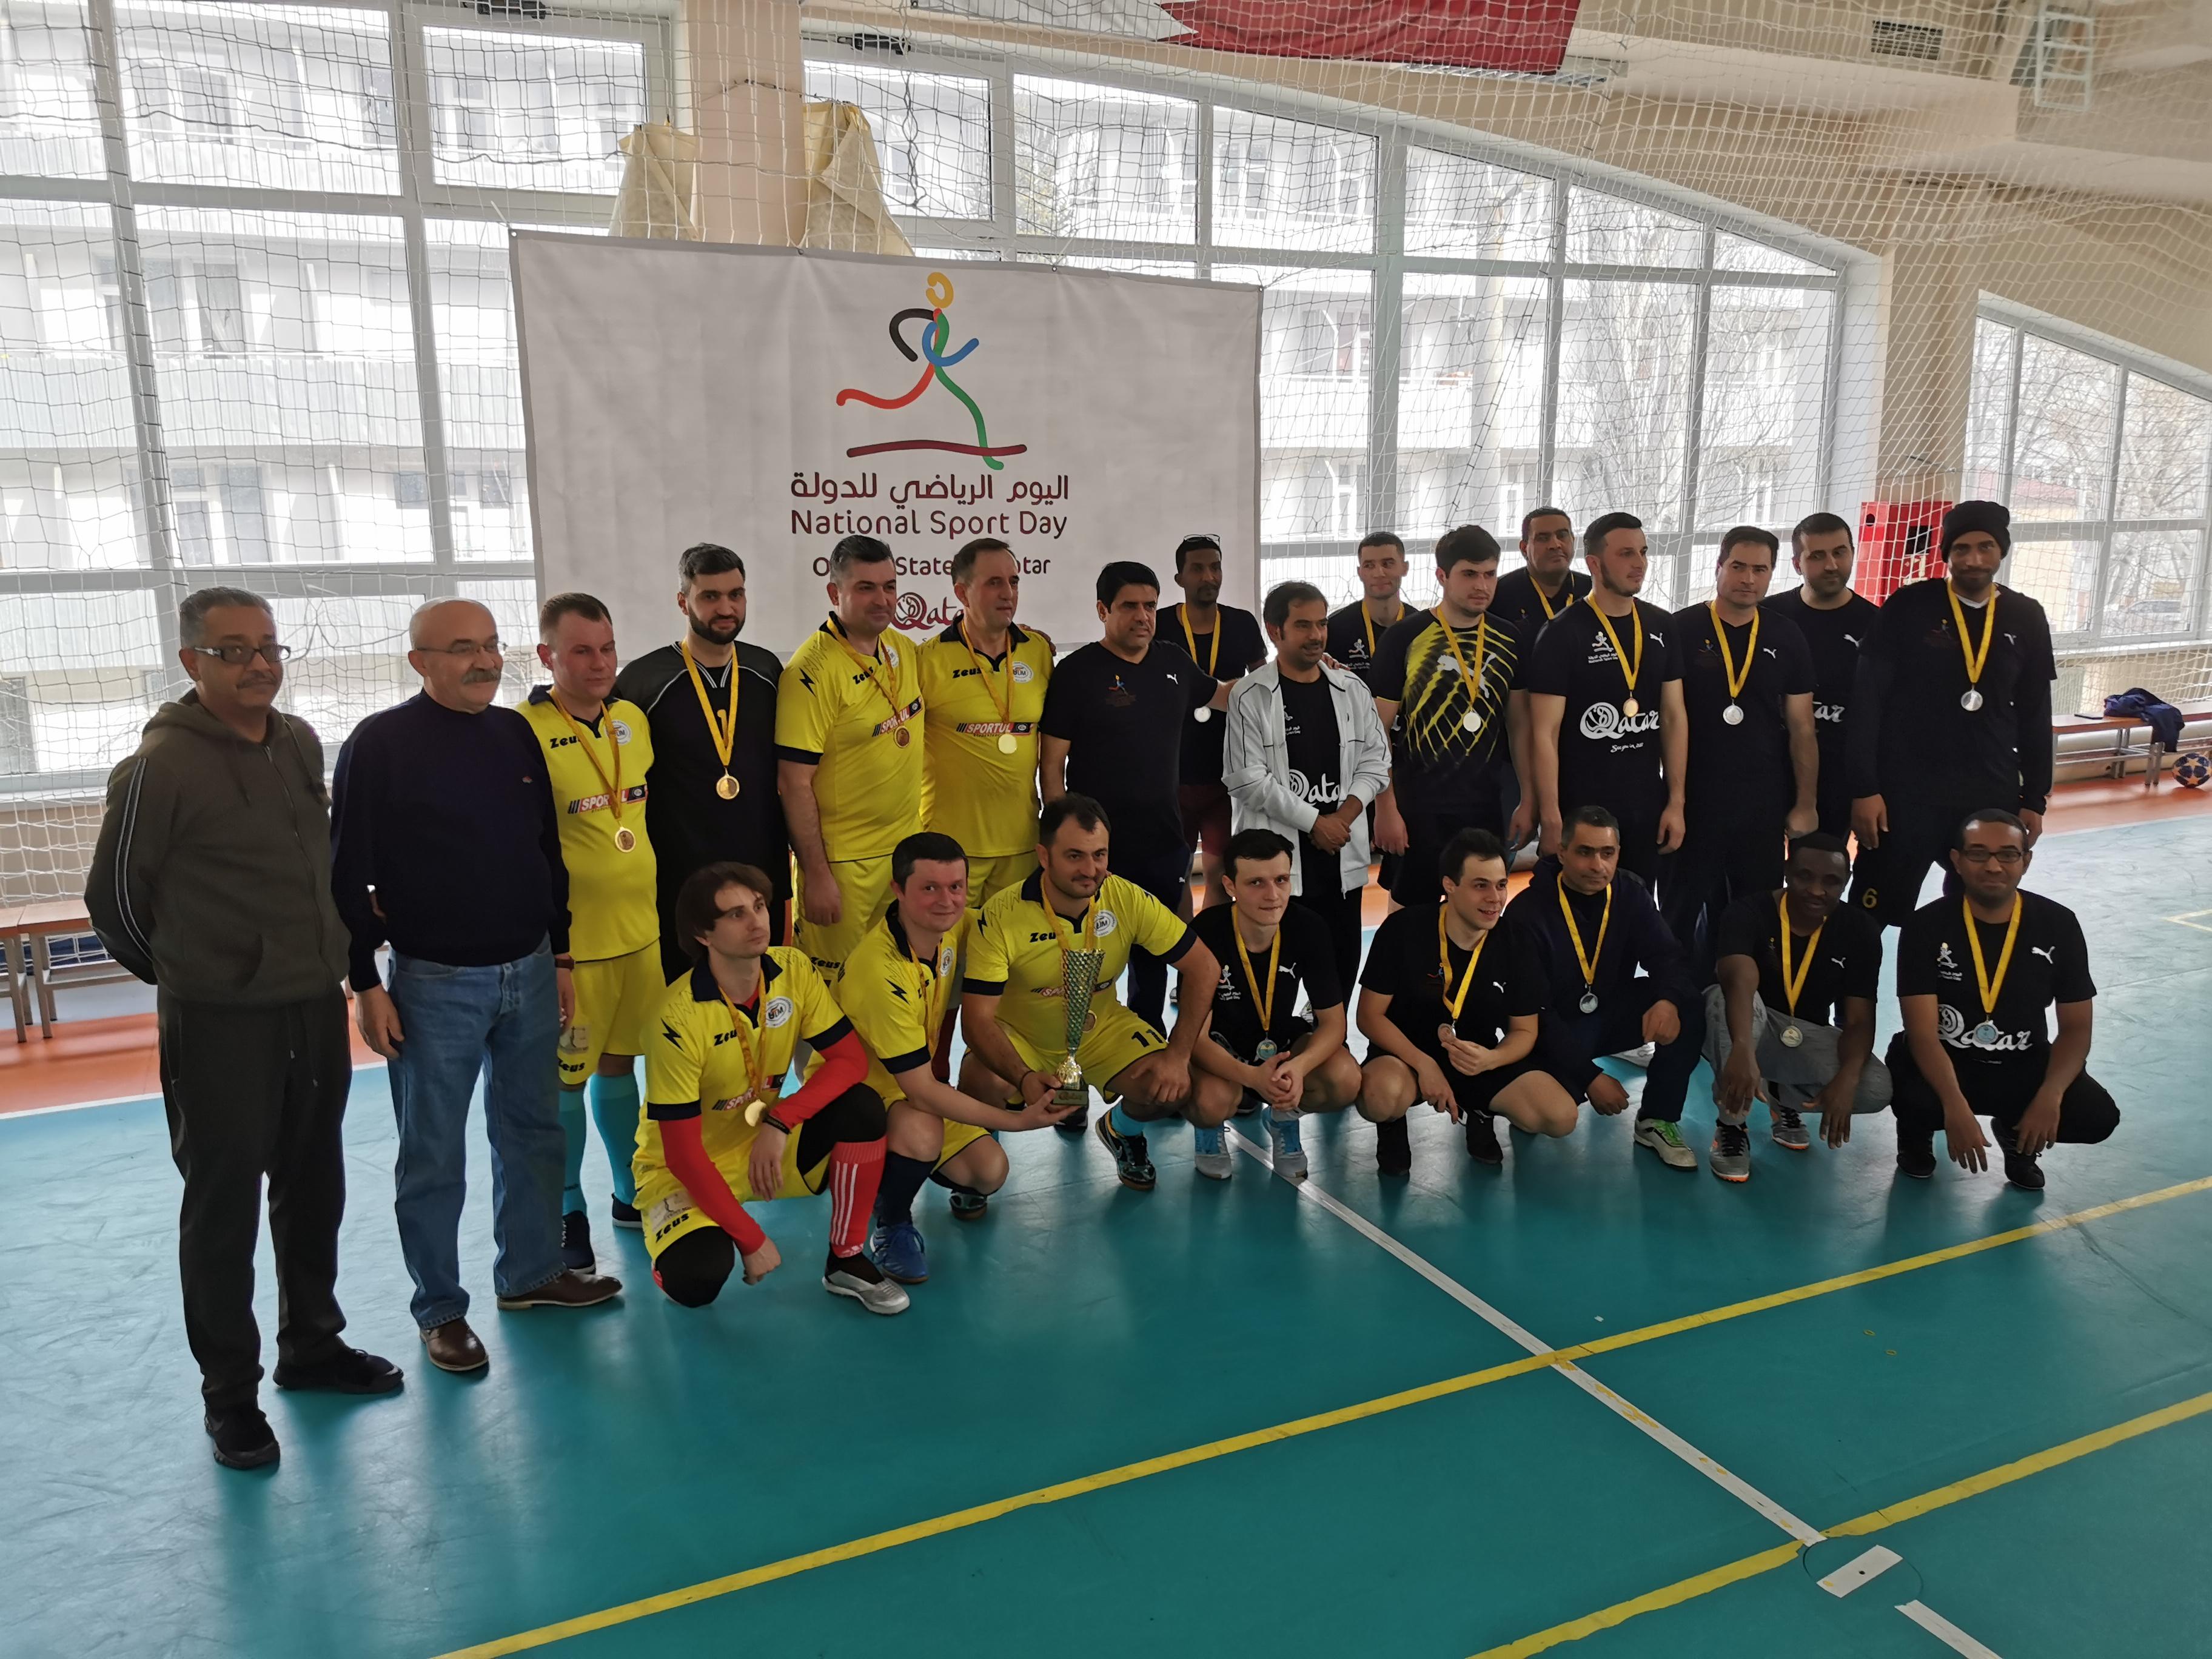 Prietenia a învins la meciul amical disputat între echipa ULIM și echipa Ambasadei Statului Qatar